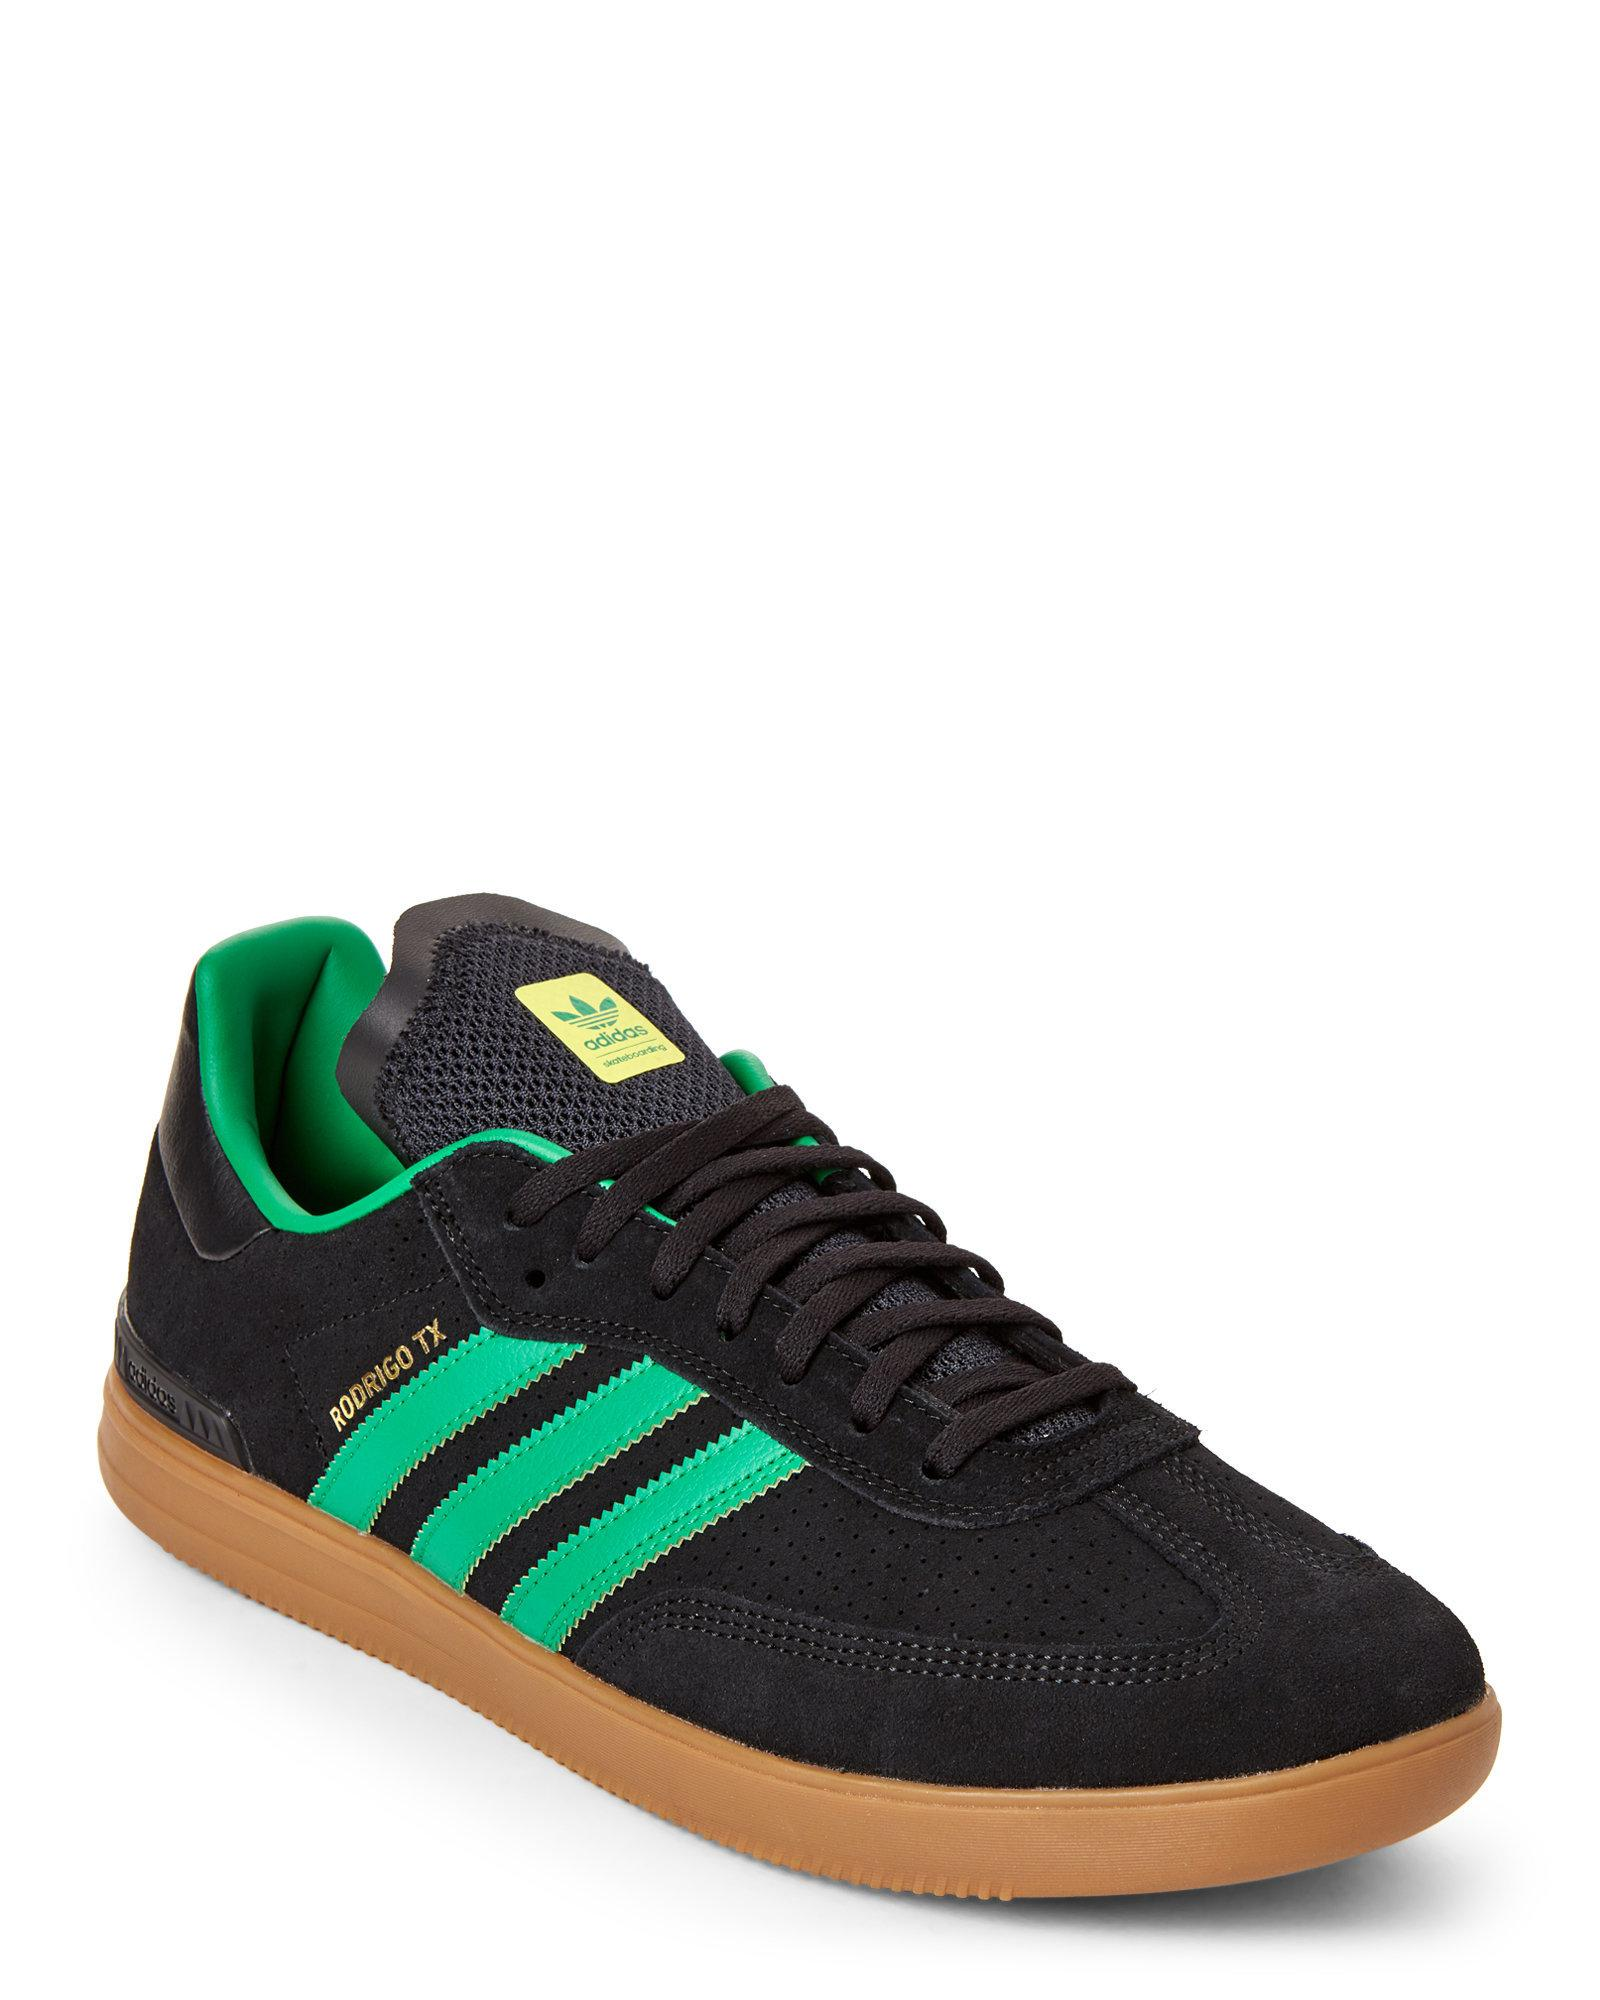 lyst adidas samba black and green vantaggio skater scarpe in verde